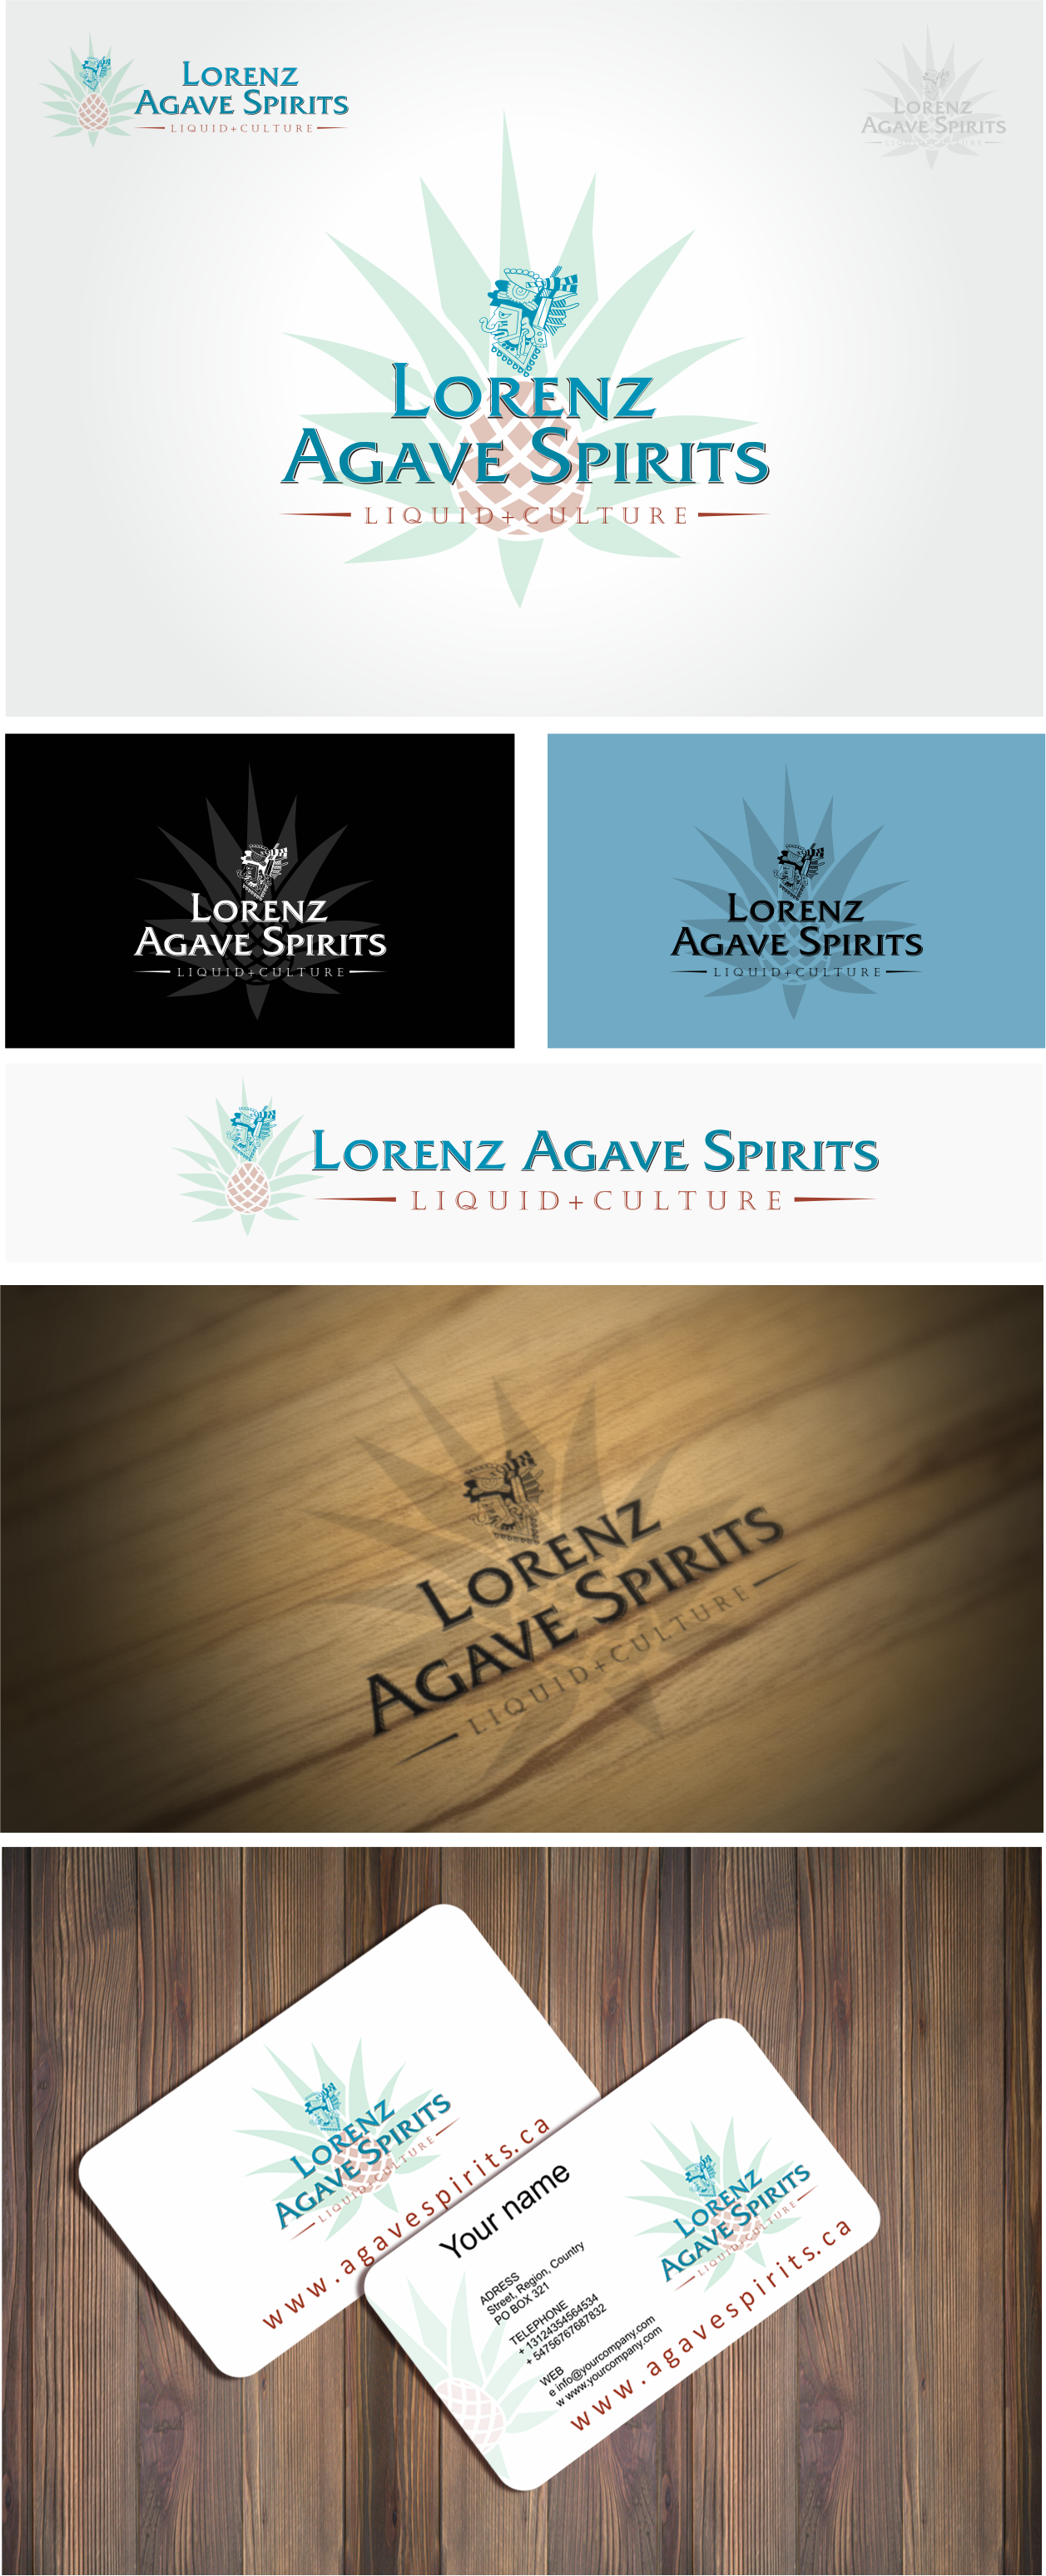 Tequila Importer - Lorenz Agave Spirits